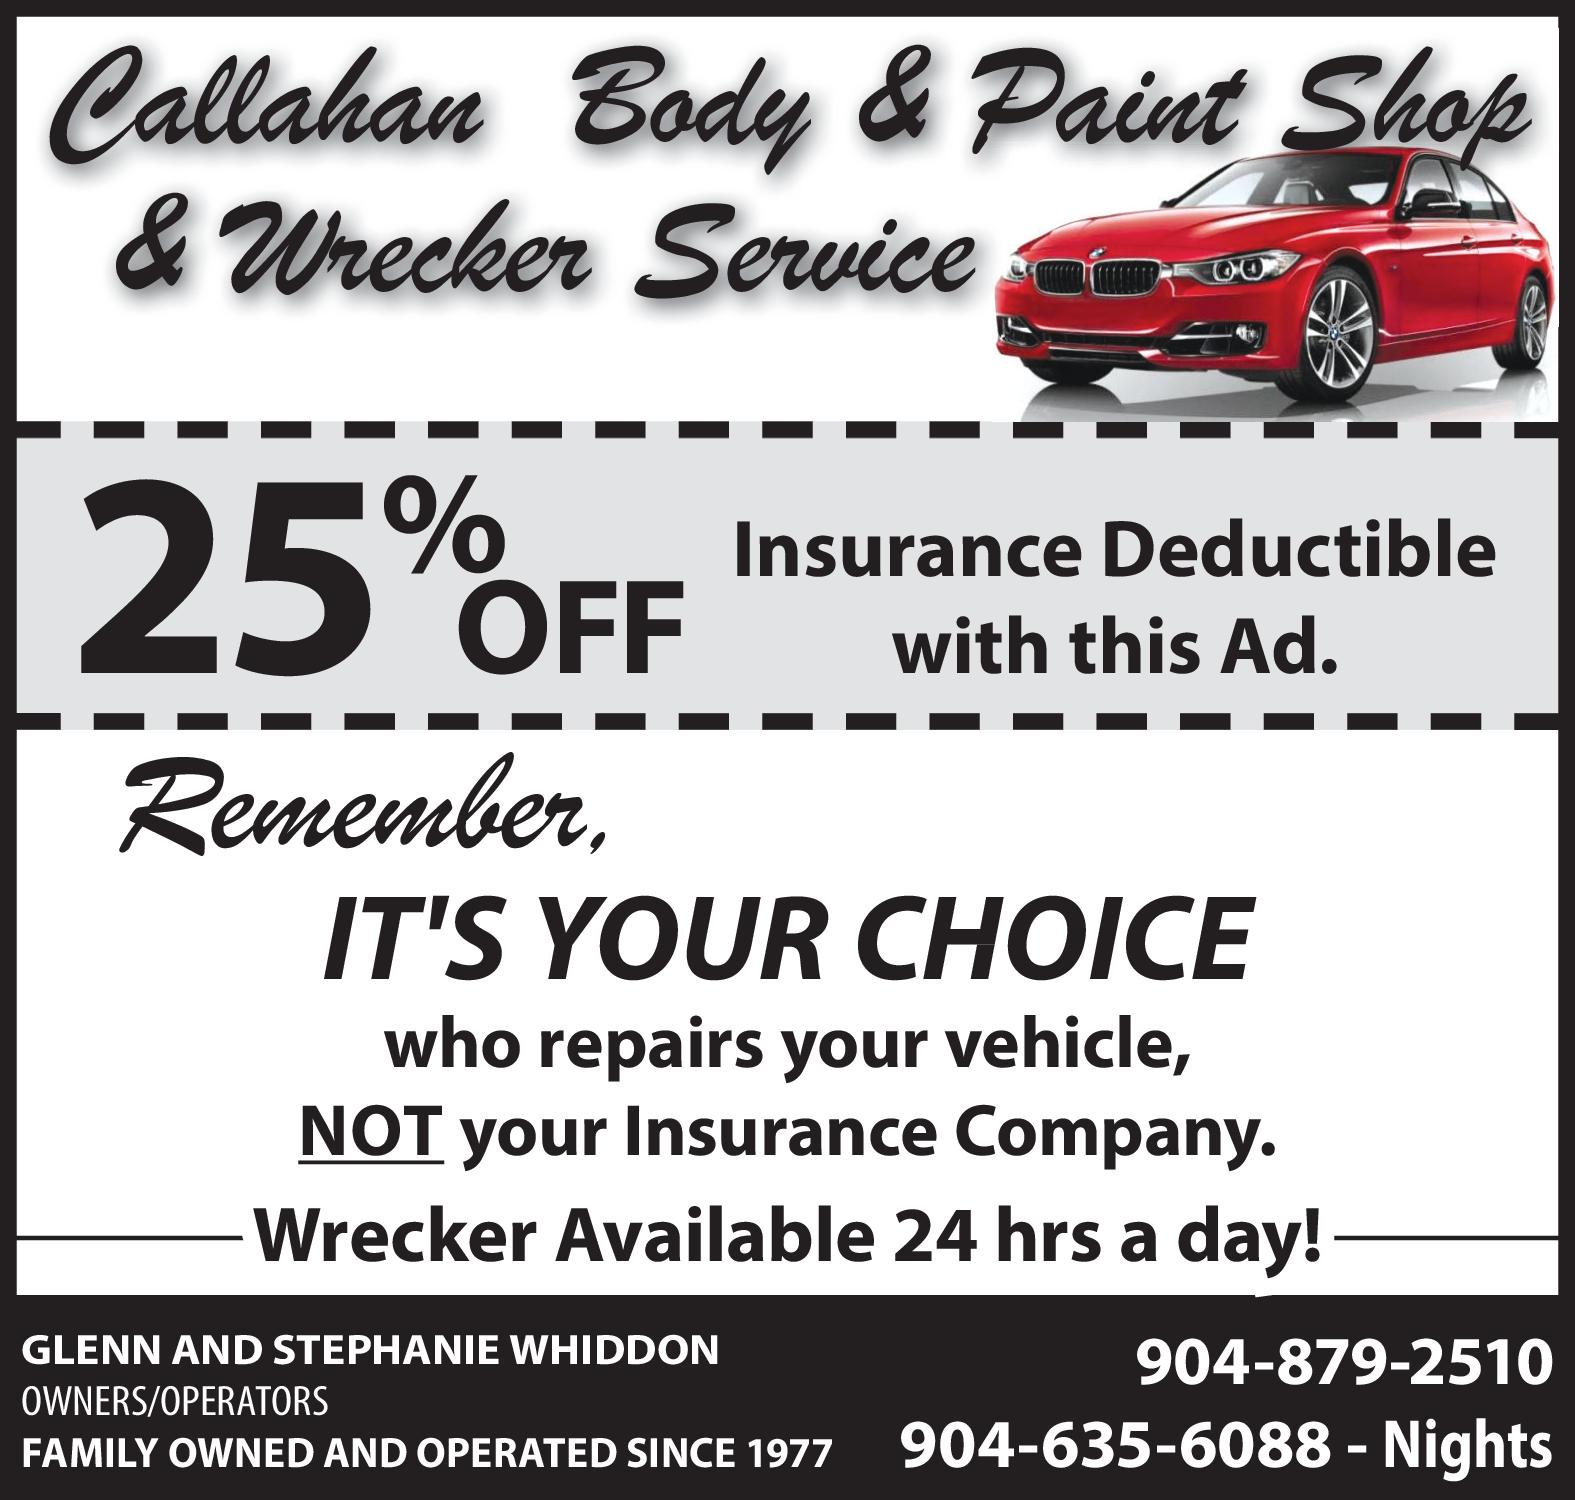 Best Automotive Repair Center In Callahan Fl Auto Repair